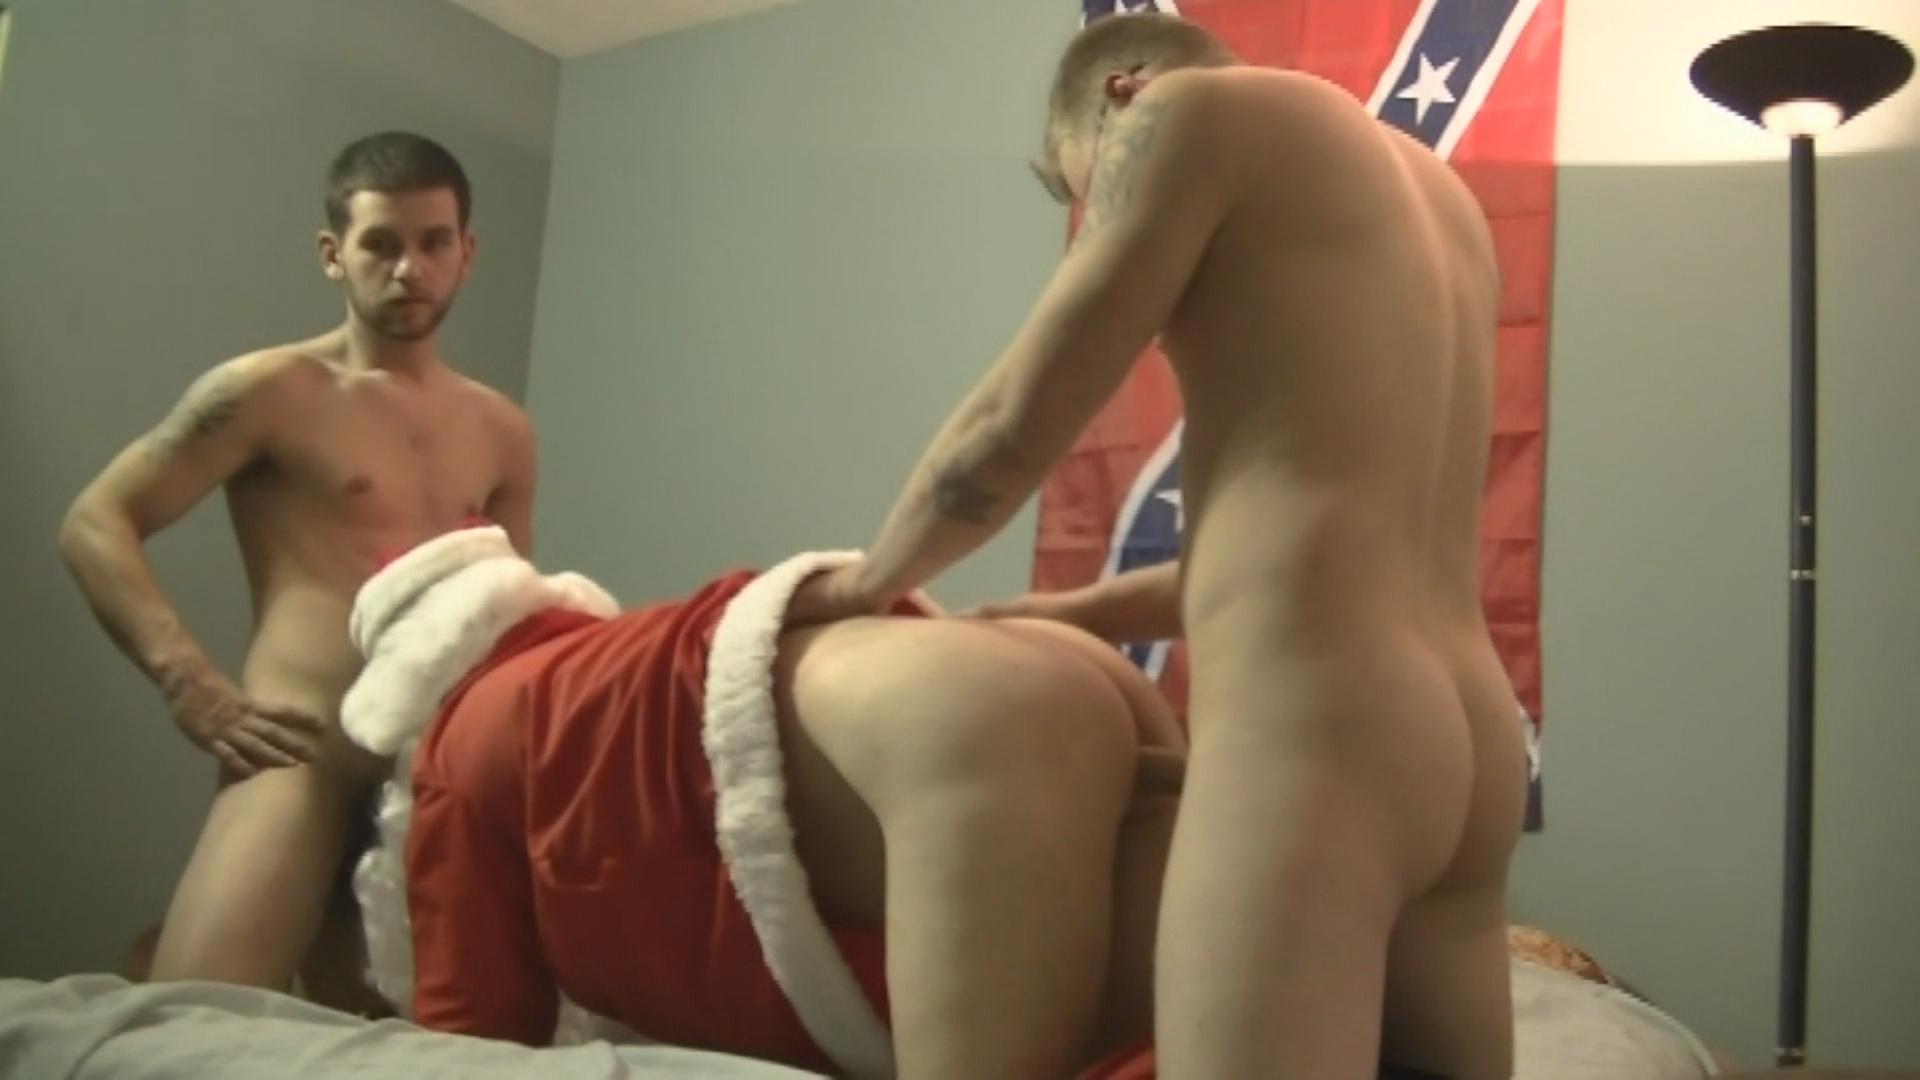 Vídeo Sexo a Três